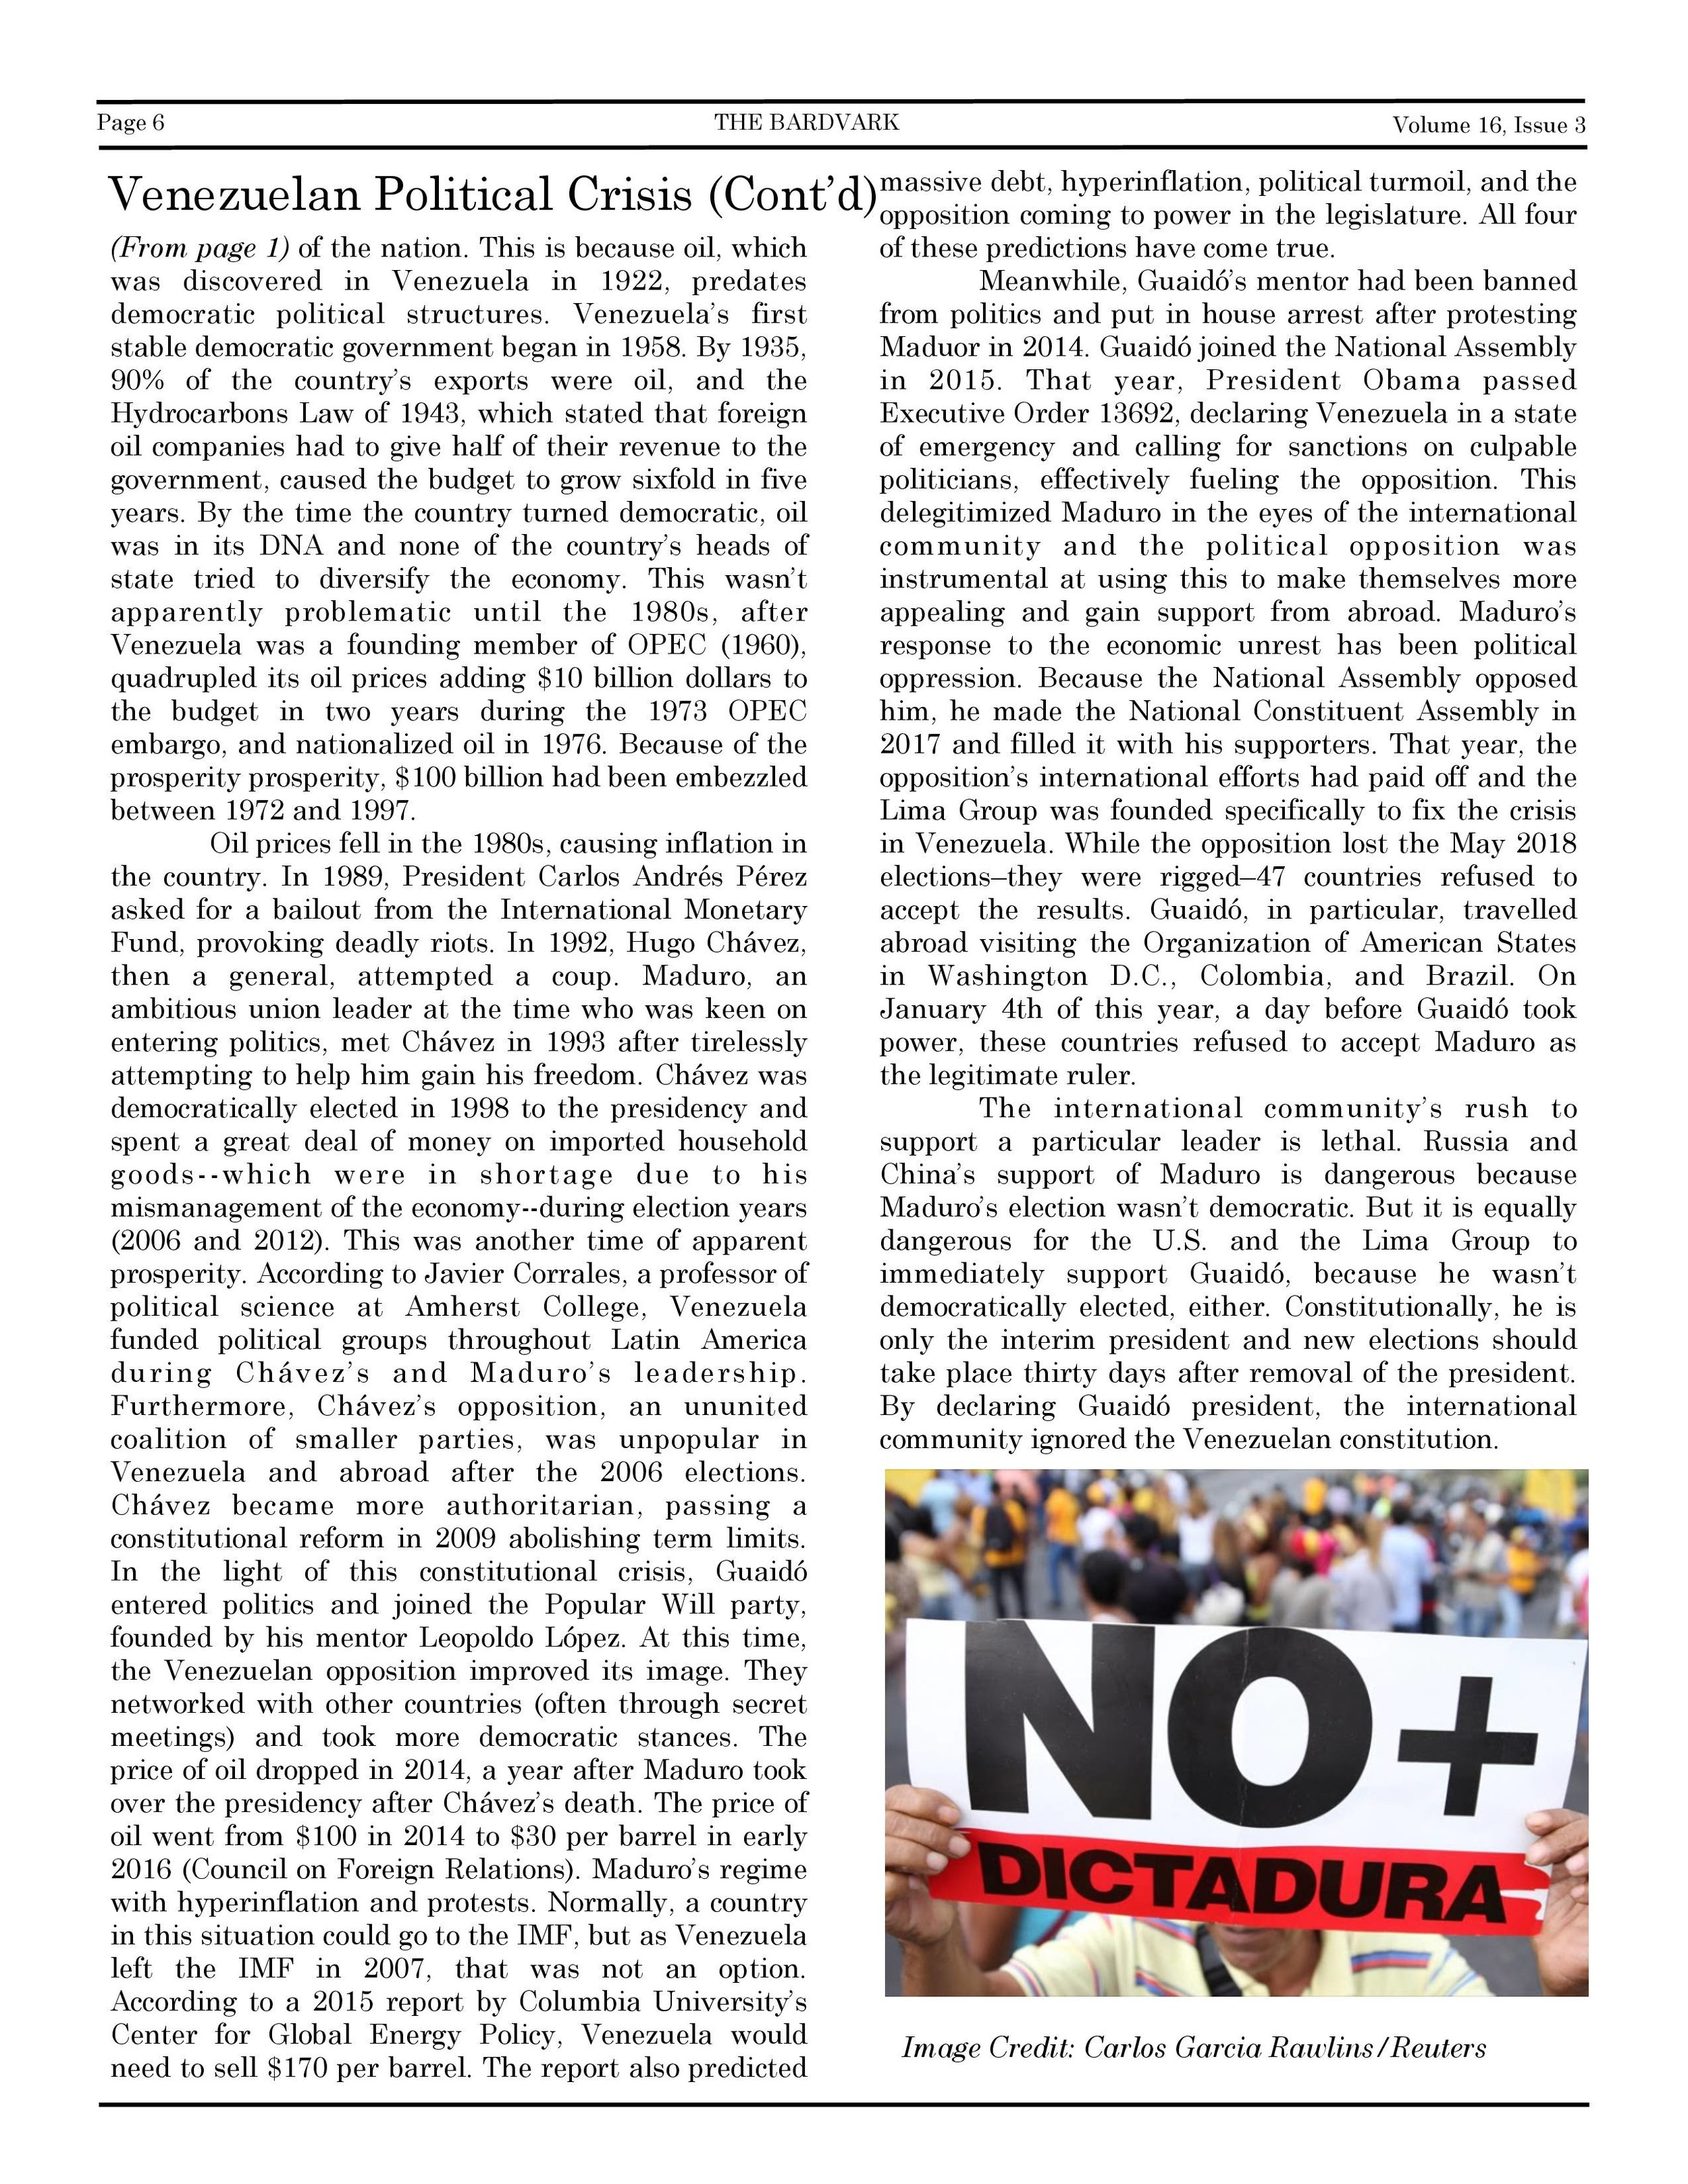 Issue 6 February 2019-6.jpg